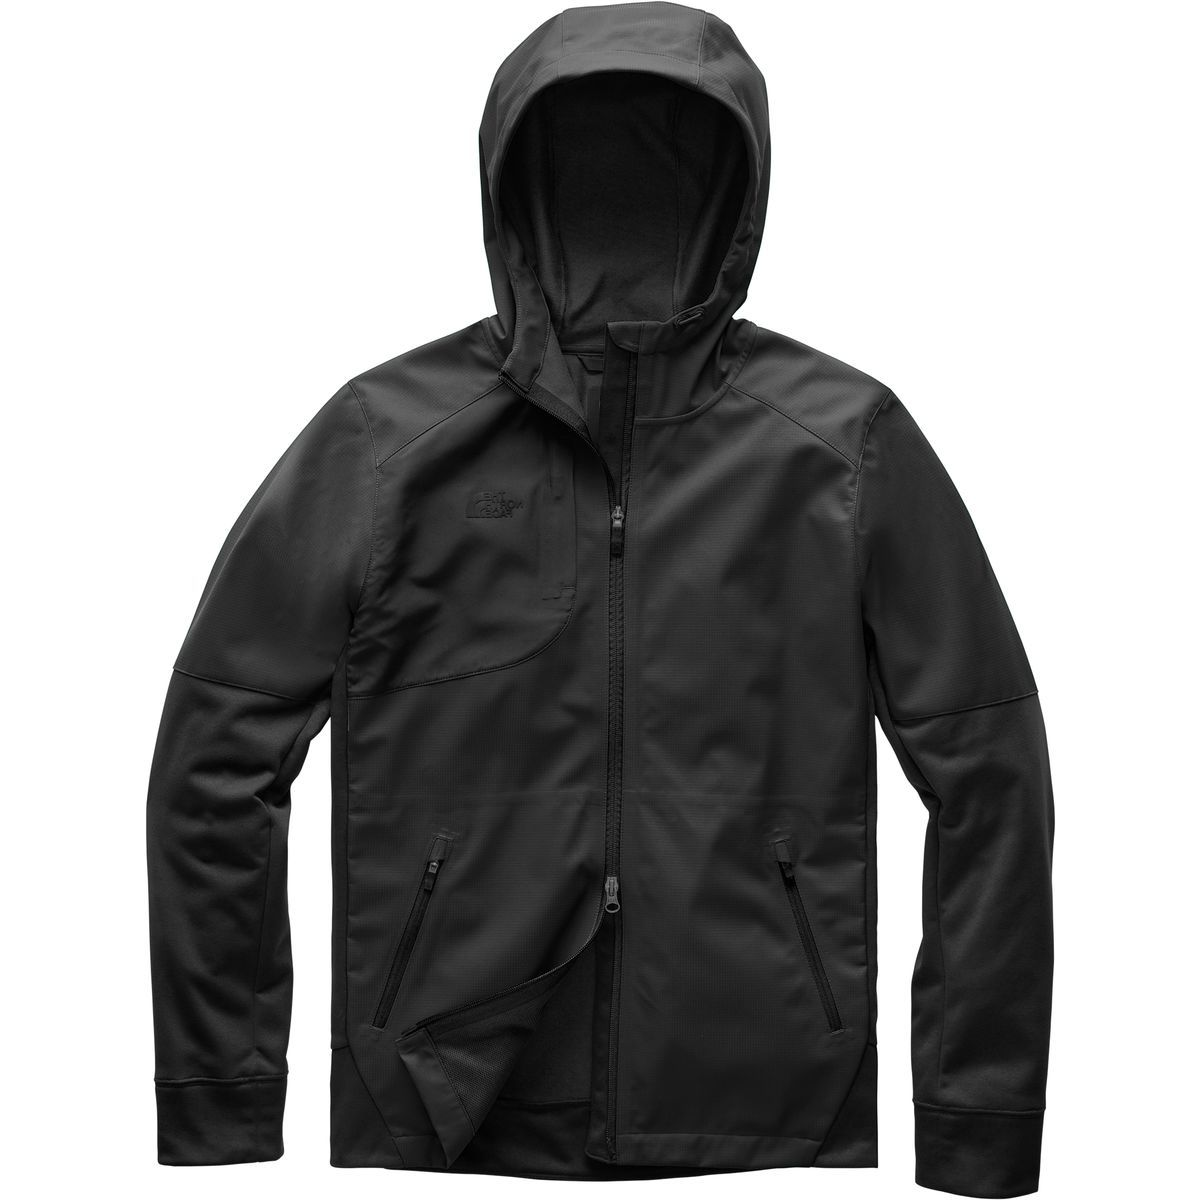 The North Face Kilowatt Jacket - Men's